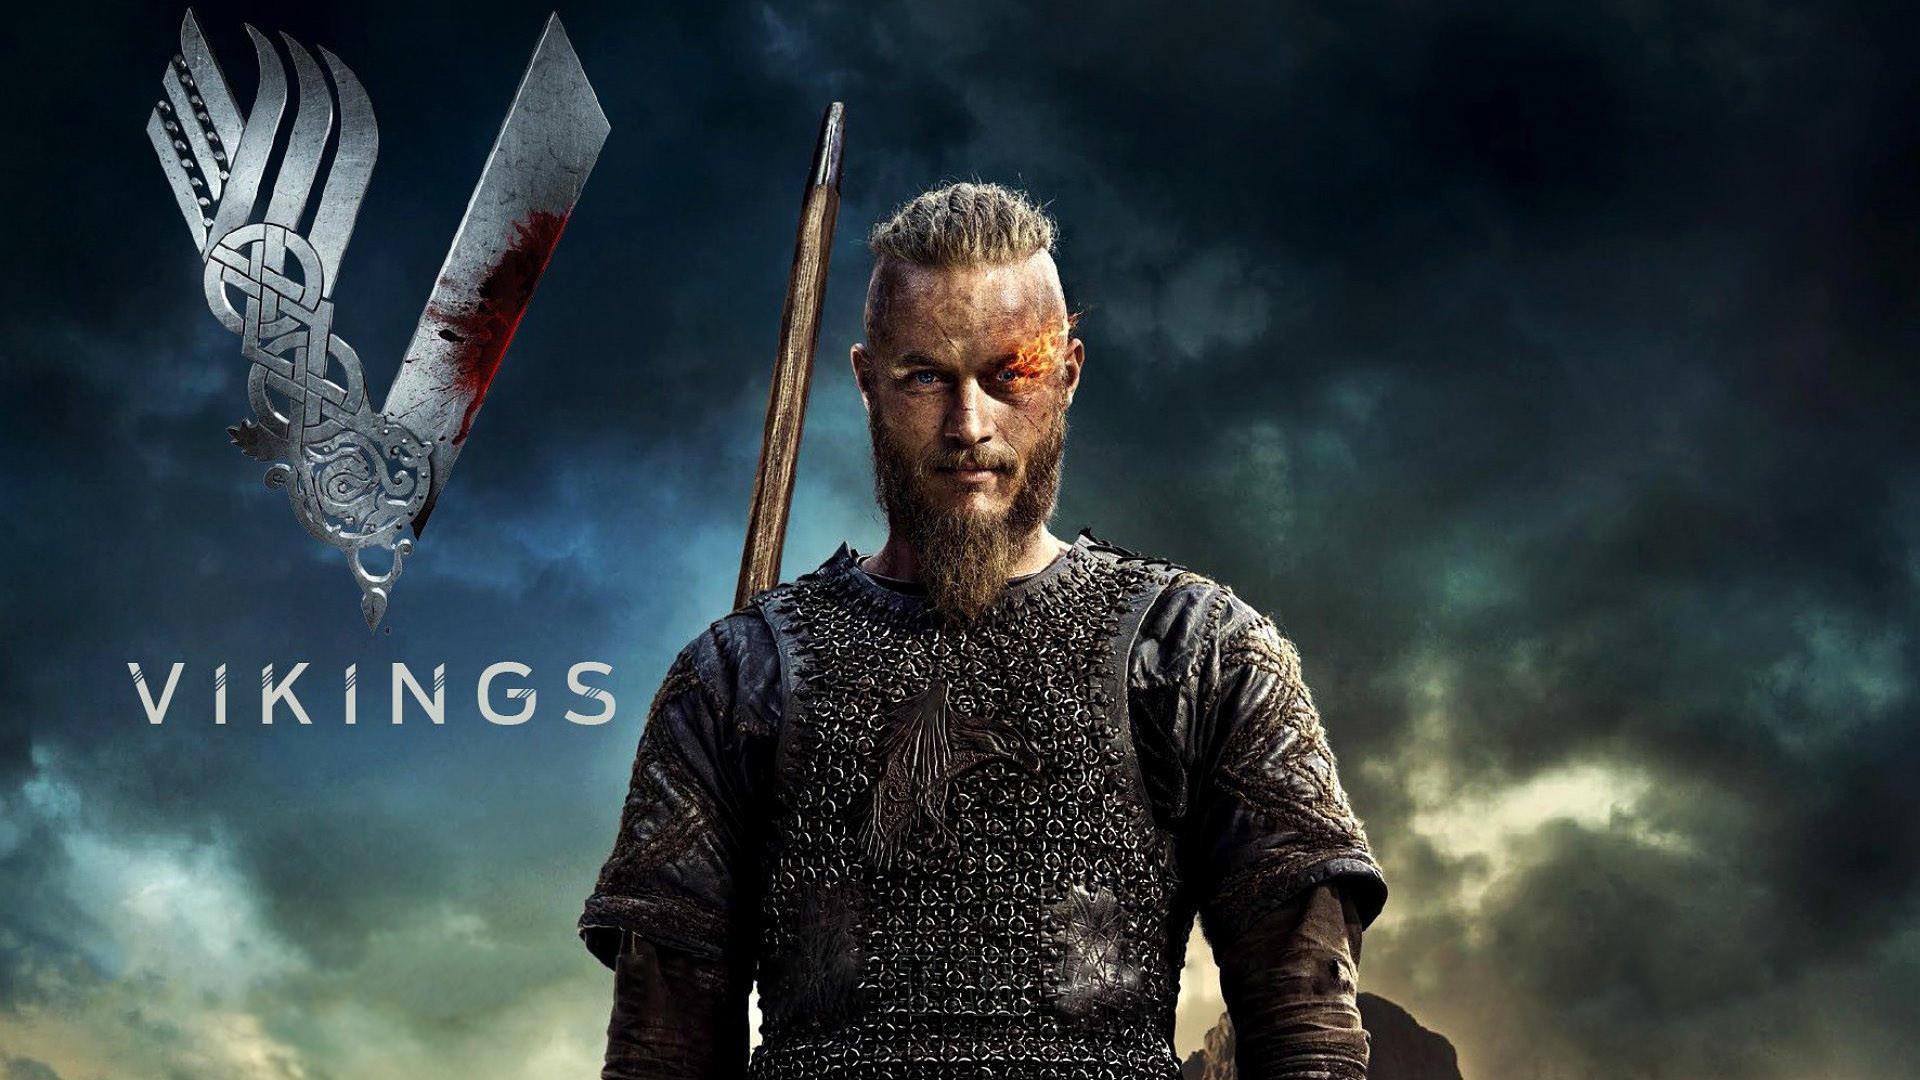 Vikings TV Show Wallpaper